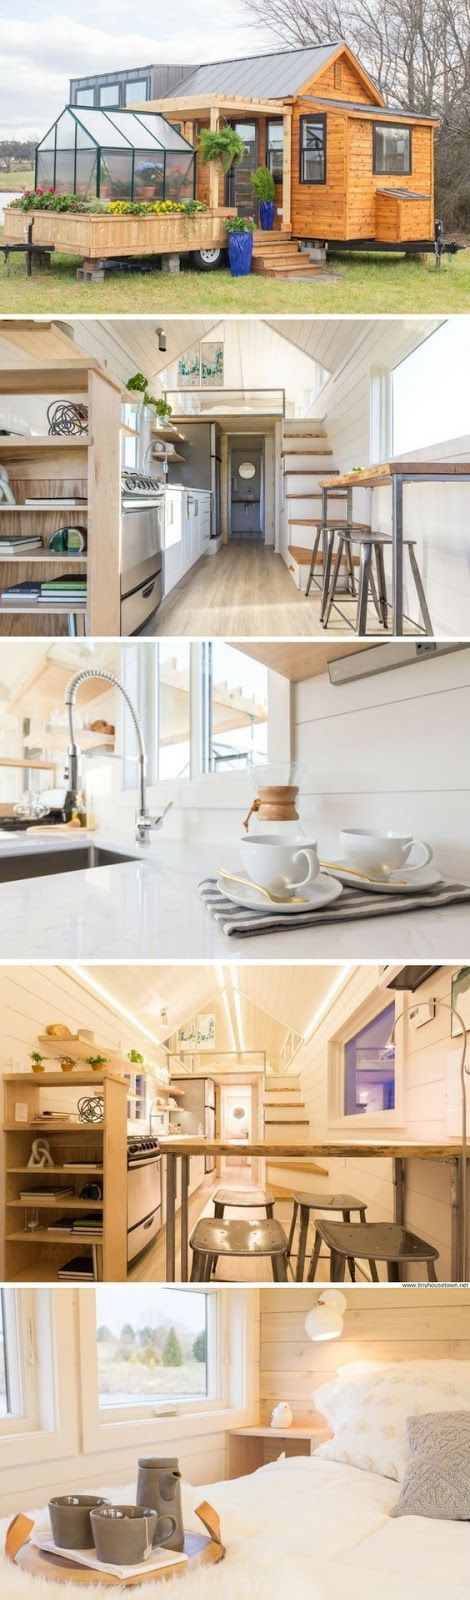 The Bellevue a stunning luxury cottage on